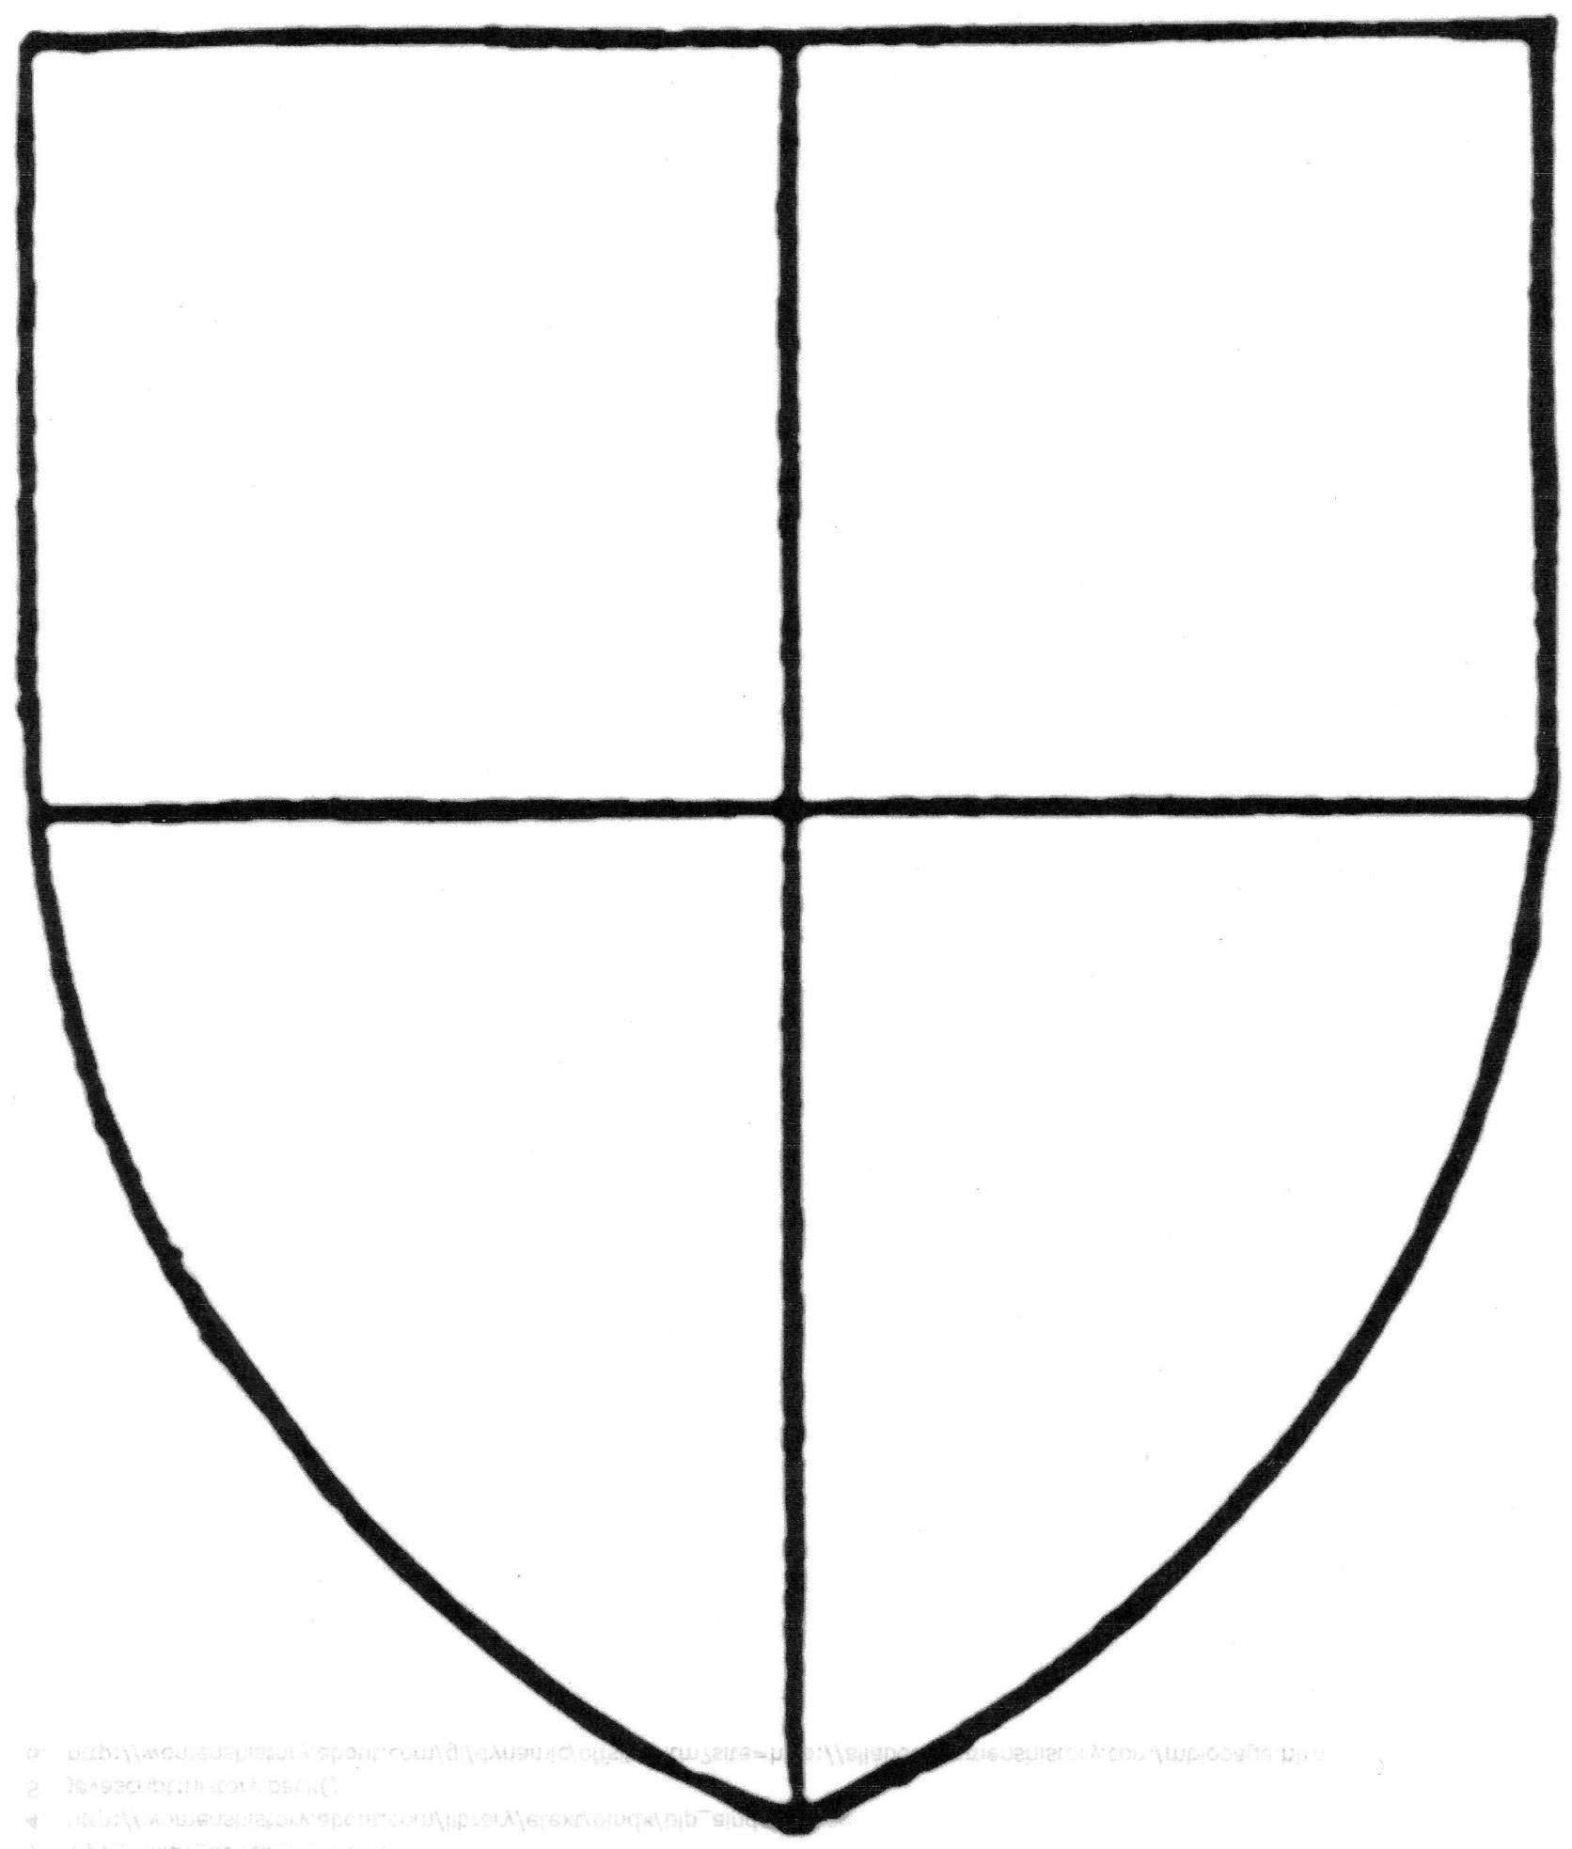 school shield template - sampletemplatess